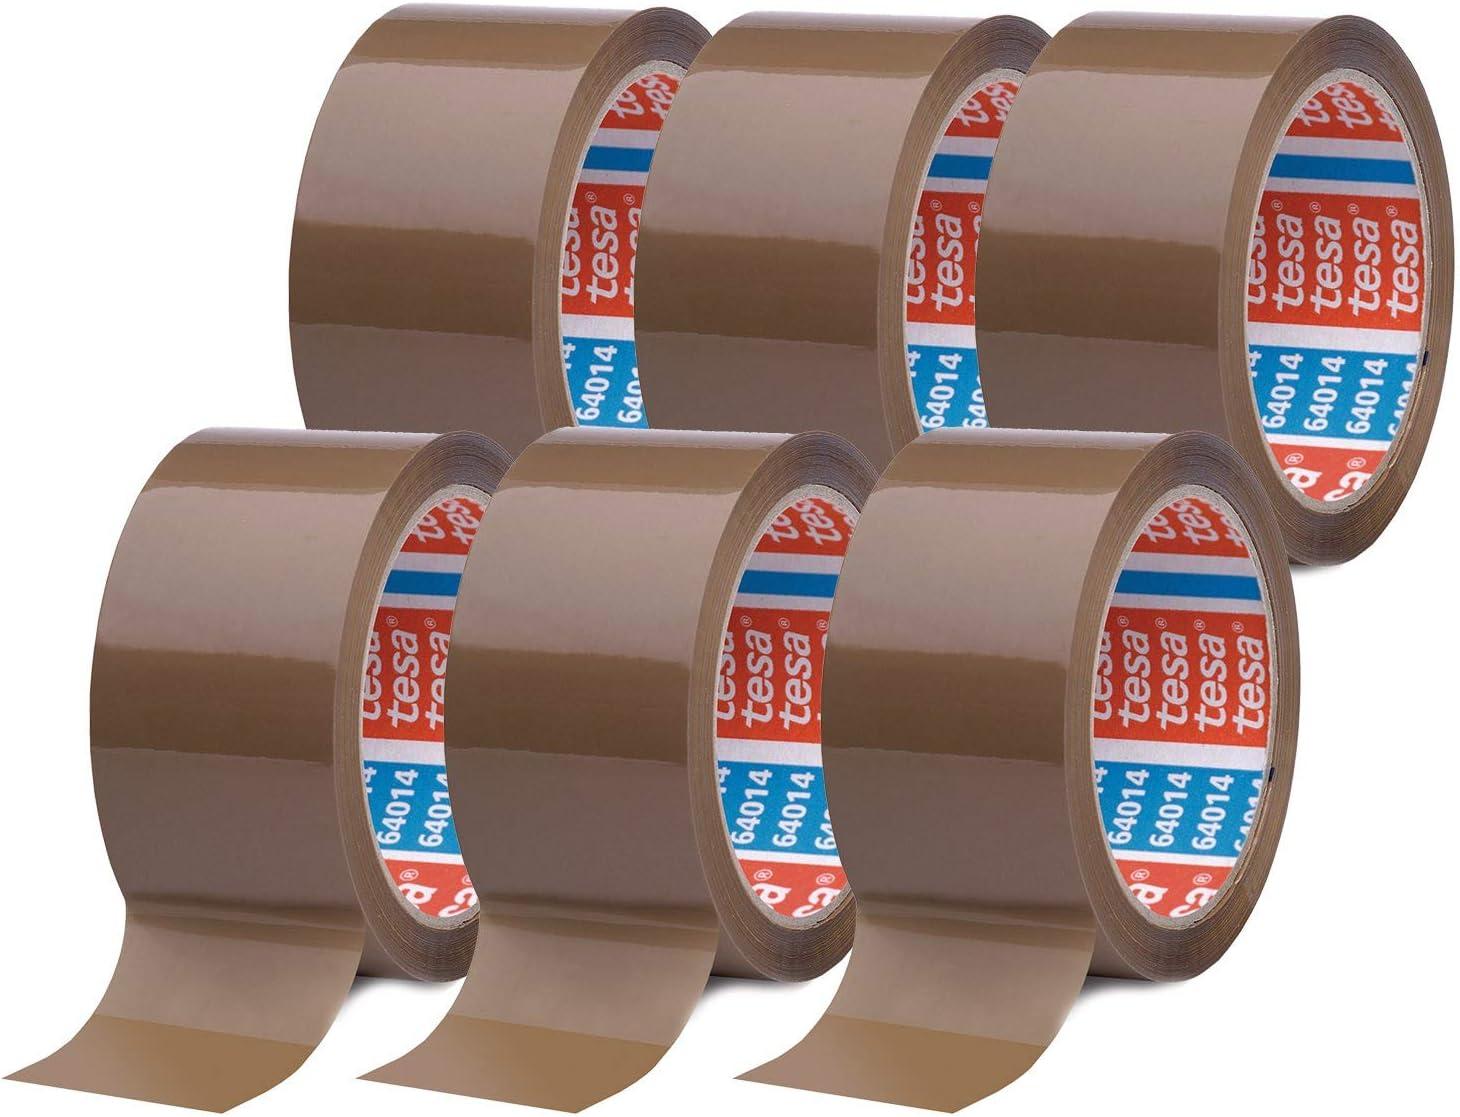 tesapack 20 im 20er Pack   Geräuscharmes Paketklebeband zum ...